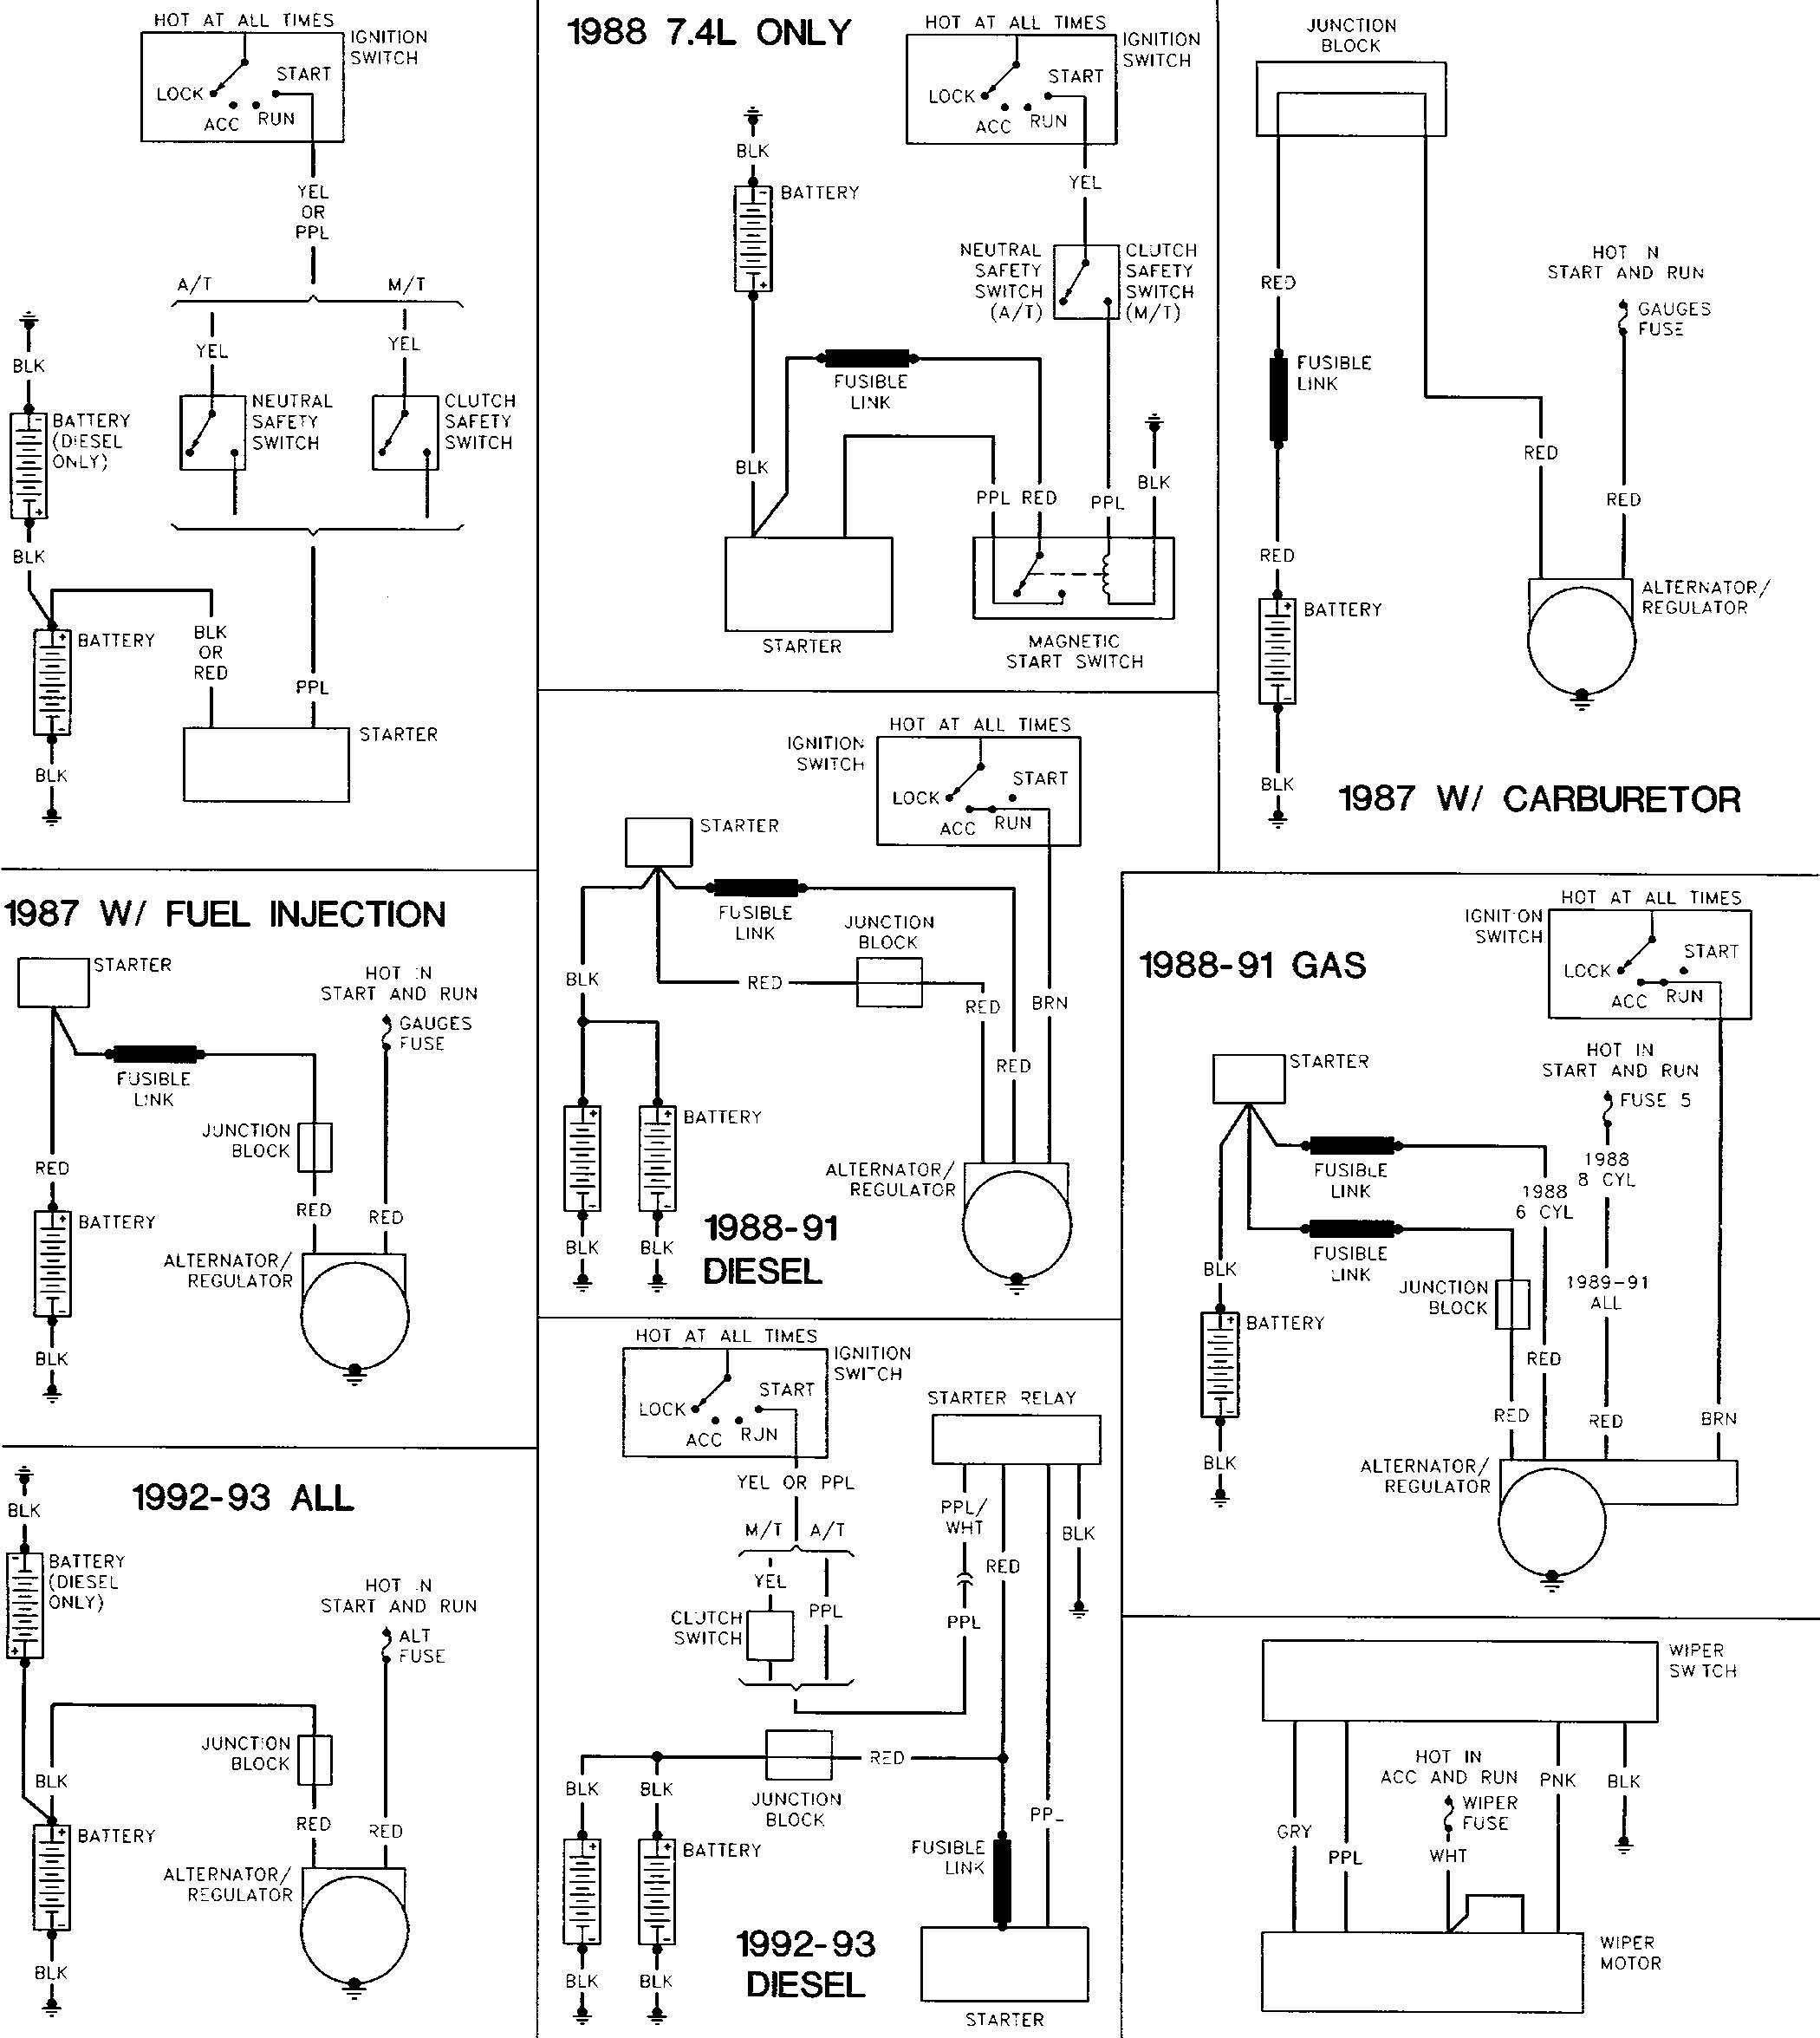 Wire Diagram for Inverter In A 2010 Tiffin Phaeton Fm 0820] Holiday Rambler Rv Wiring Diagram Schematic Wiring Of Wire Diagram for Inverter In A 2010 Tiffin Phaeton